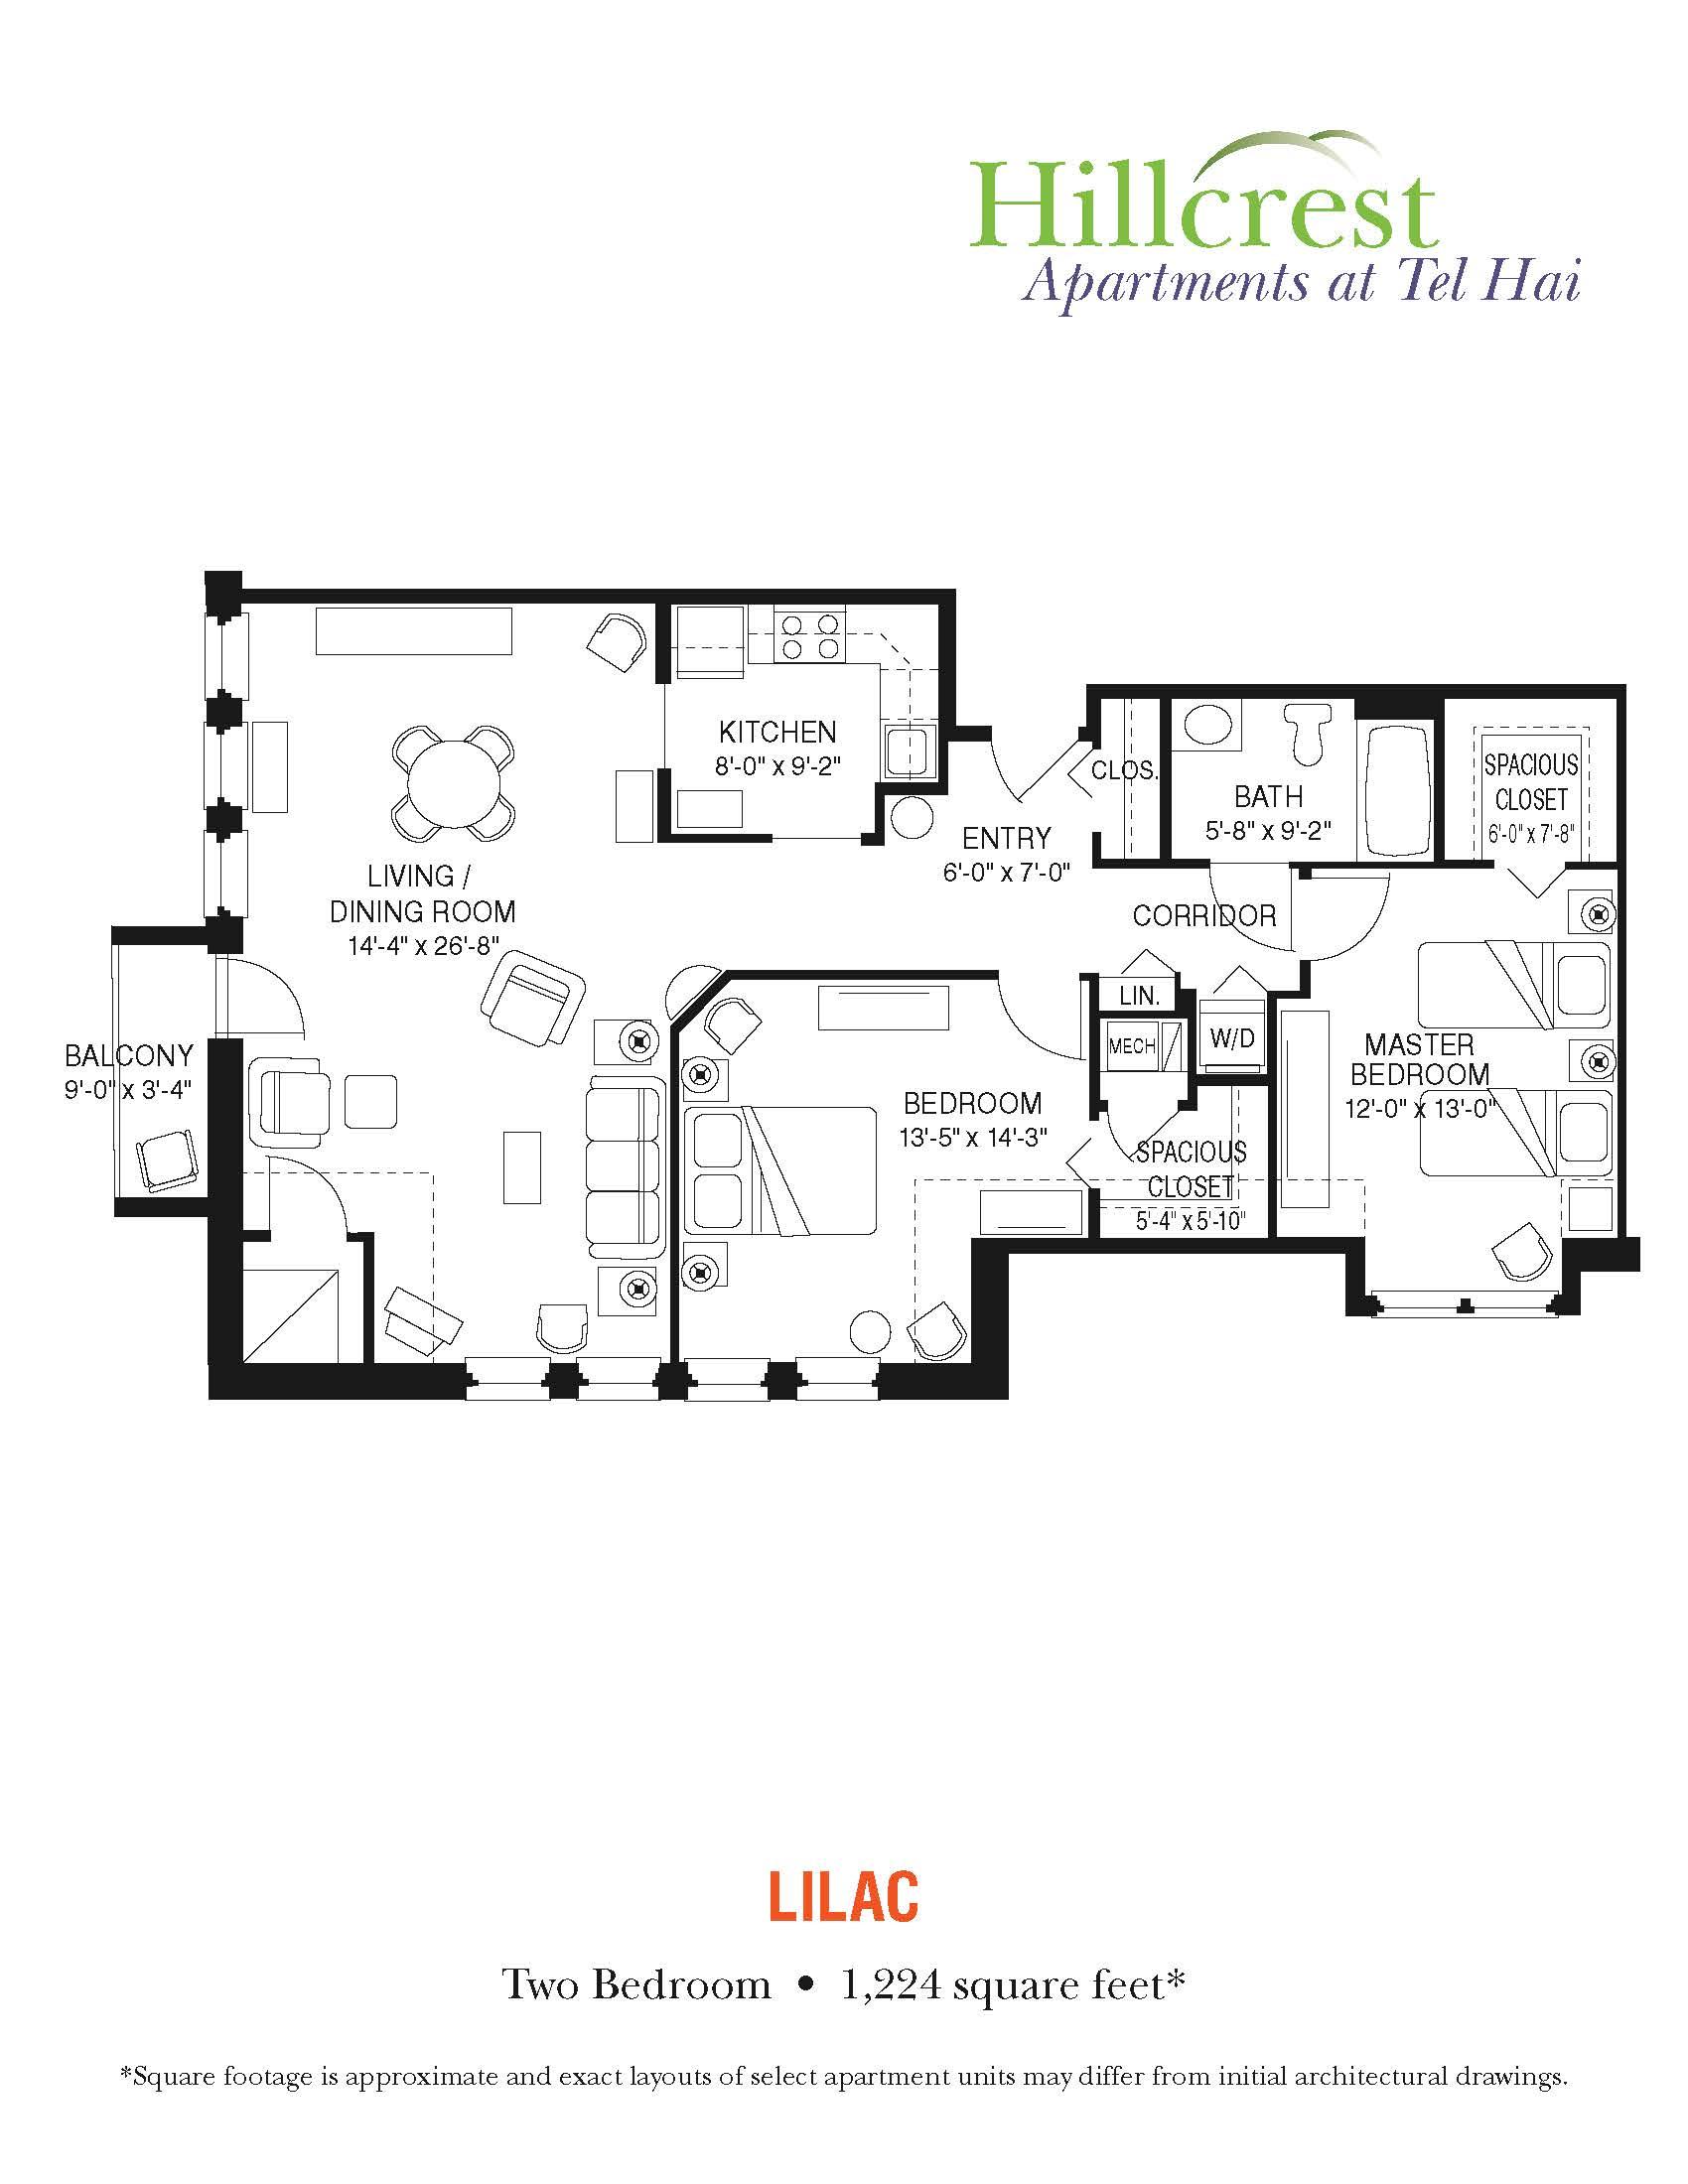 Lilac Apartment at Tel Hai